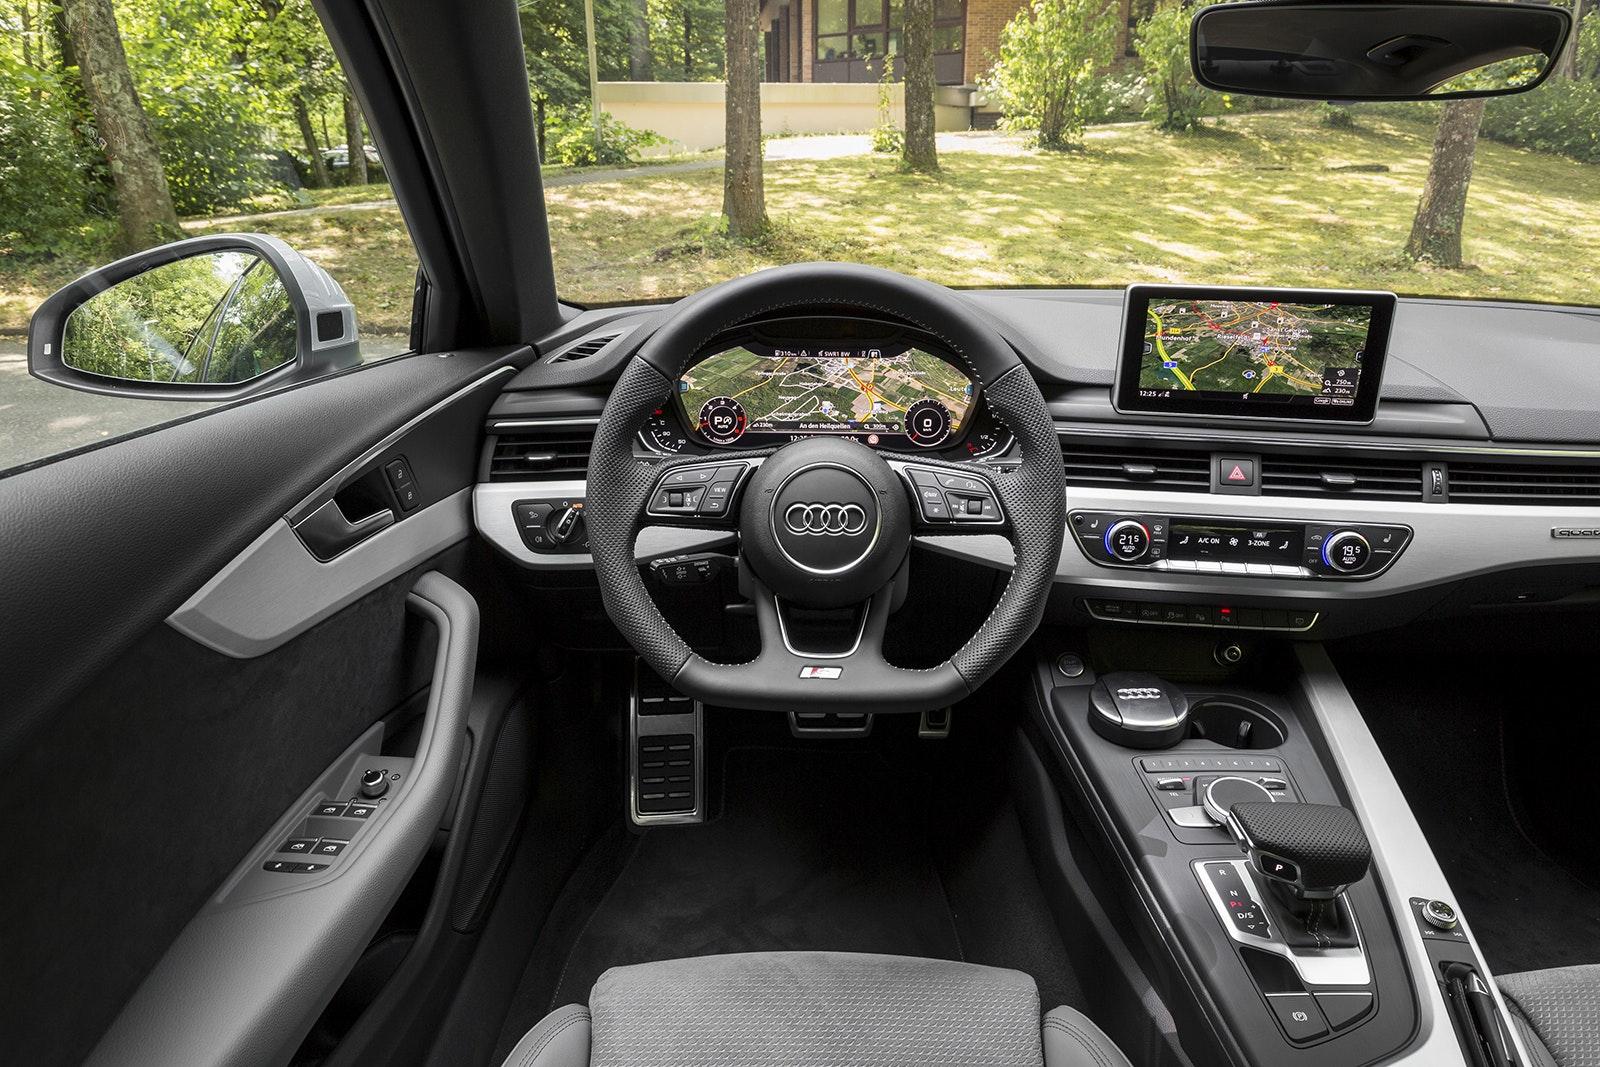 Audi A4 Avant Review | carwow